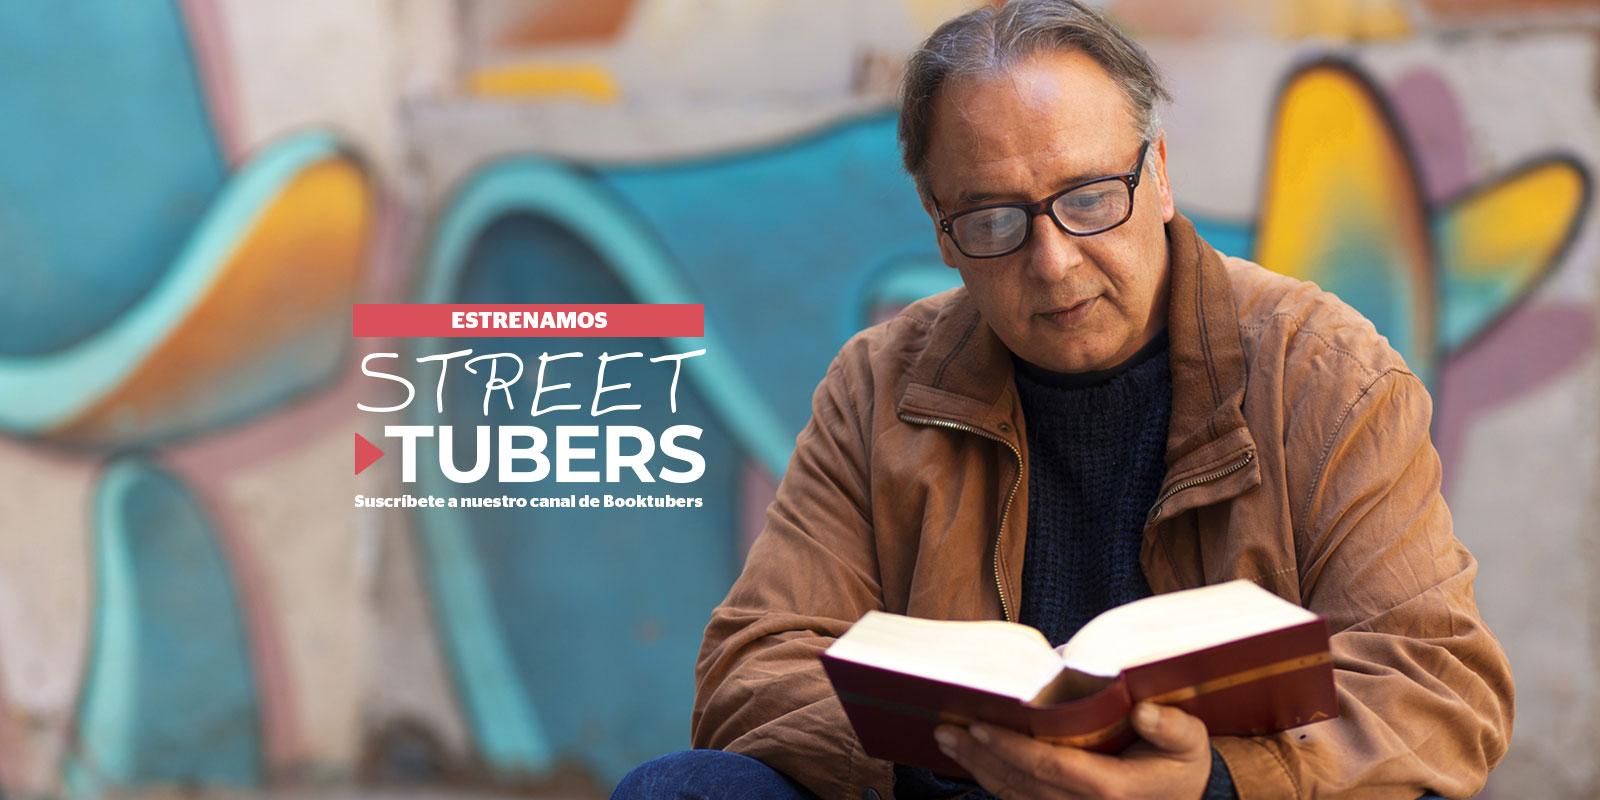 StreetTubers, críticas literarias que rompen prejuicios